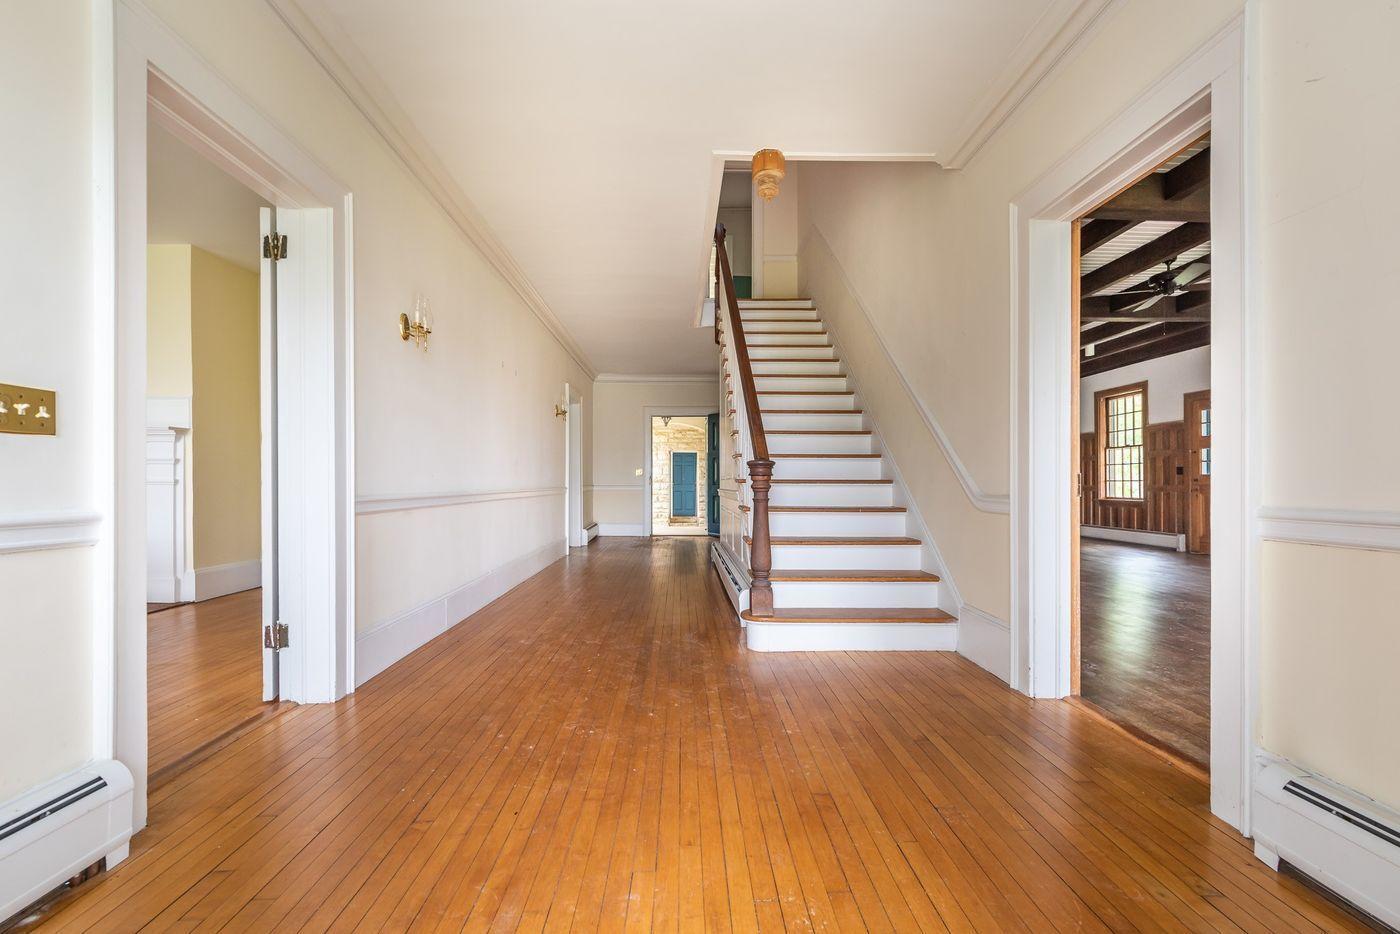 Property located at 602-606 Hartsville New Marlborough Rd New Marlborough MA 01230 photo